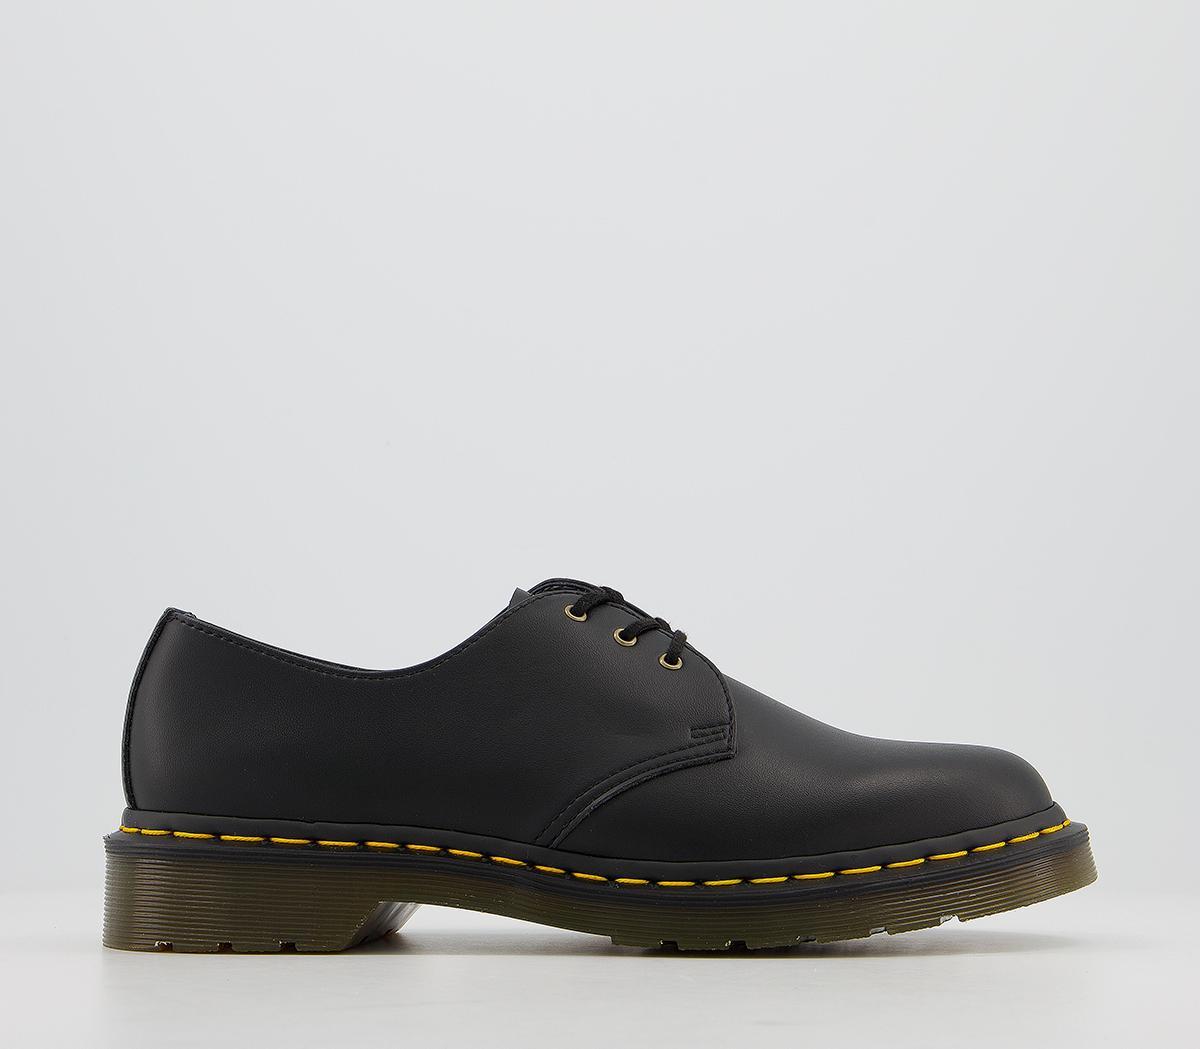 Vegan 1461 3 Eye Shoes M